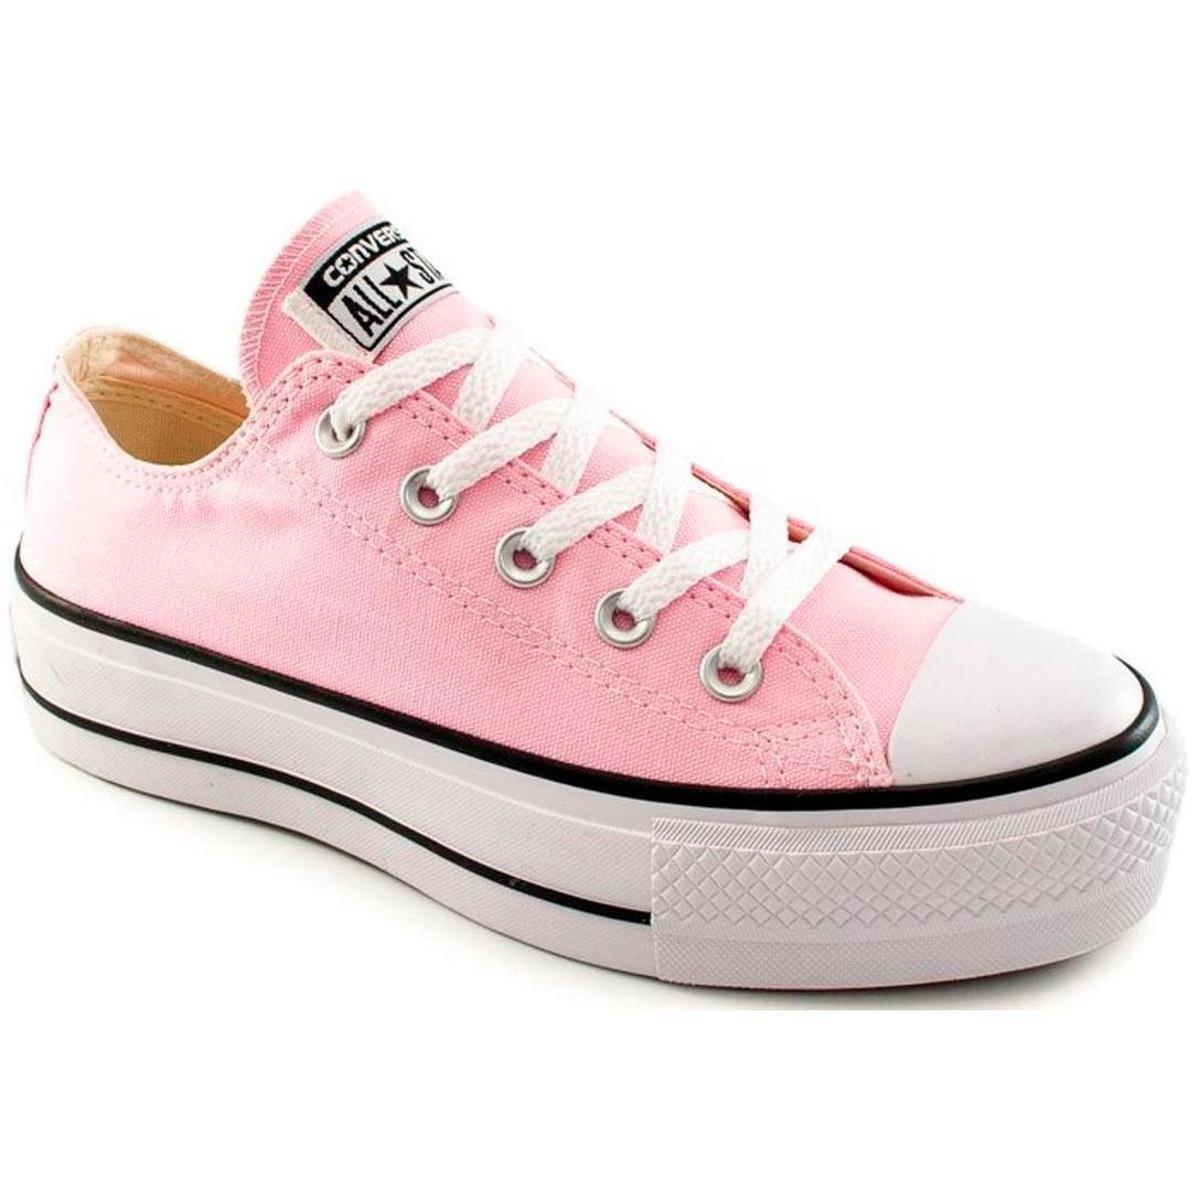 converse platform donna rosa